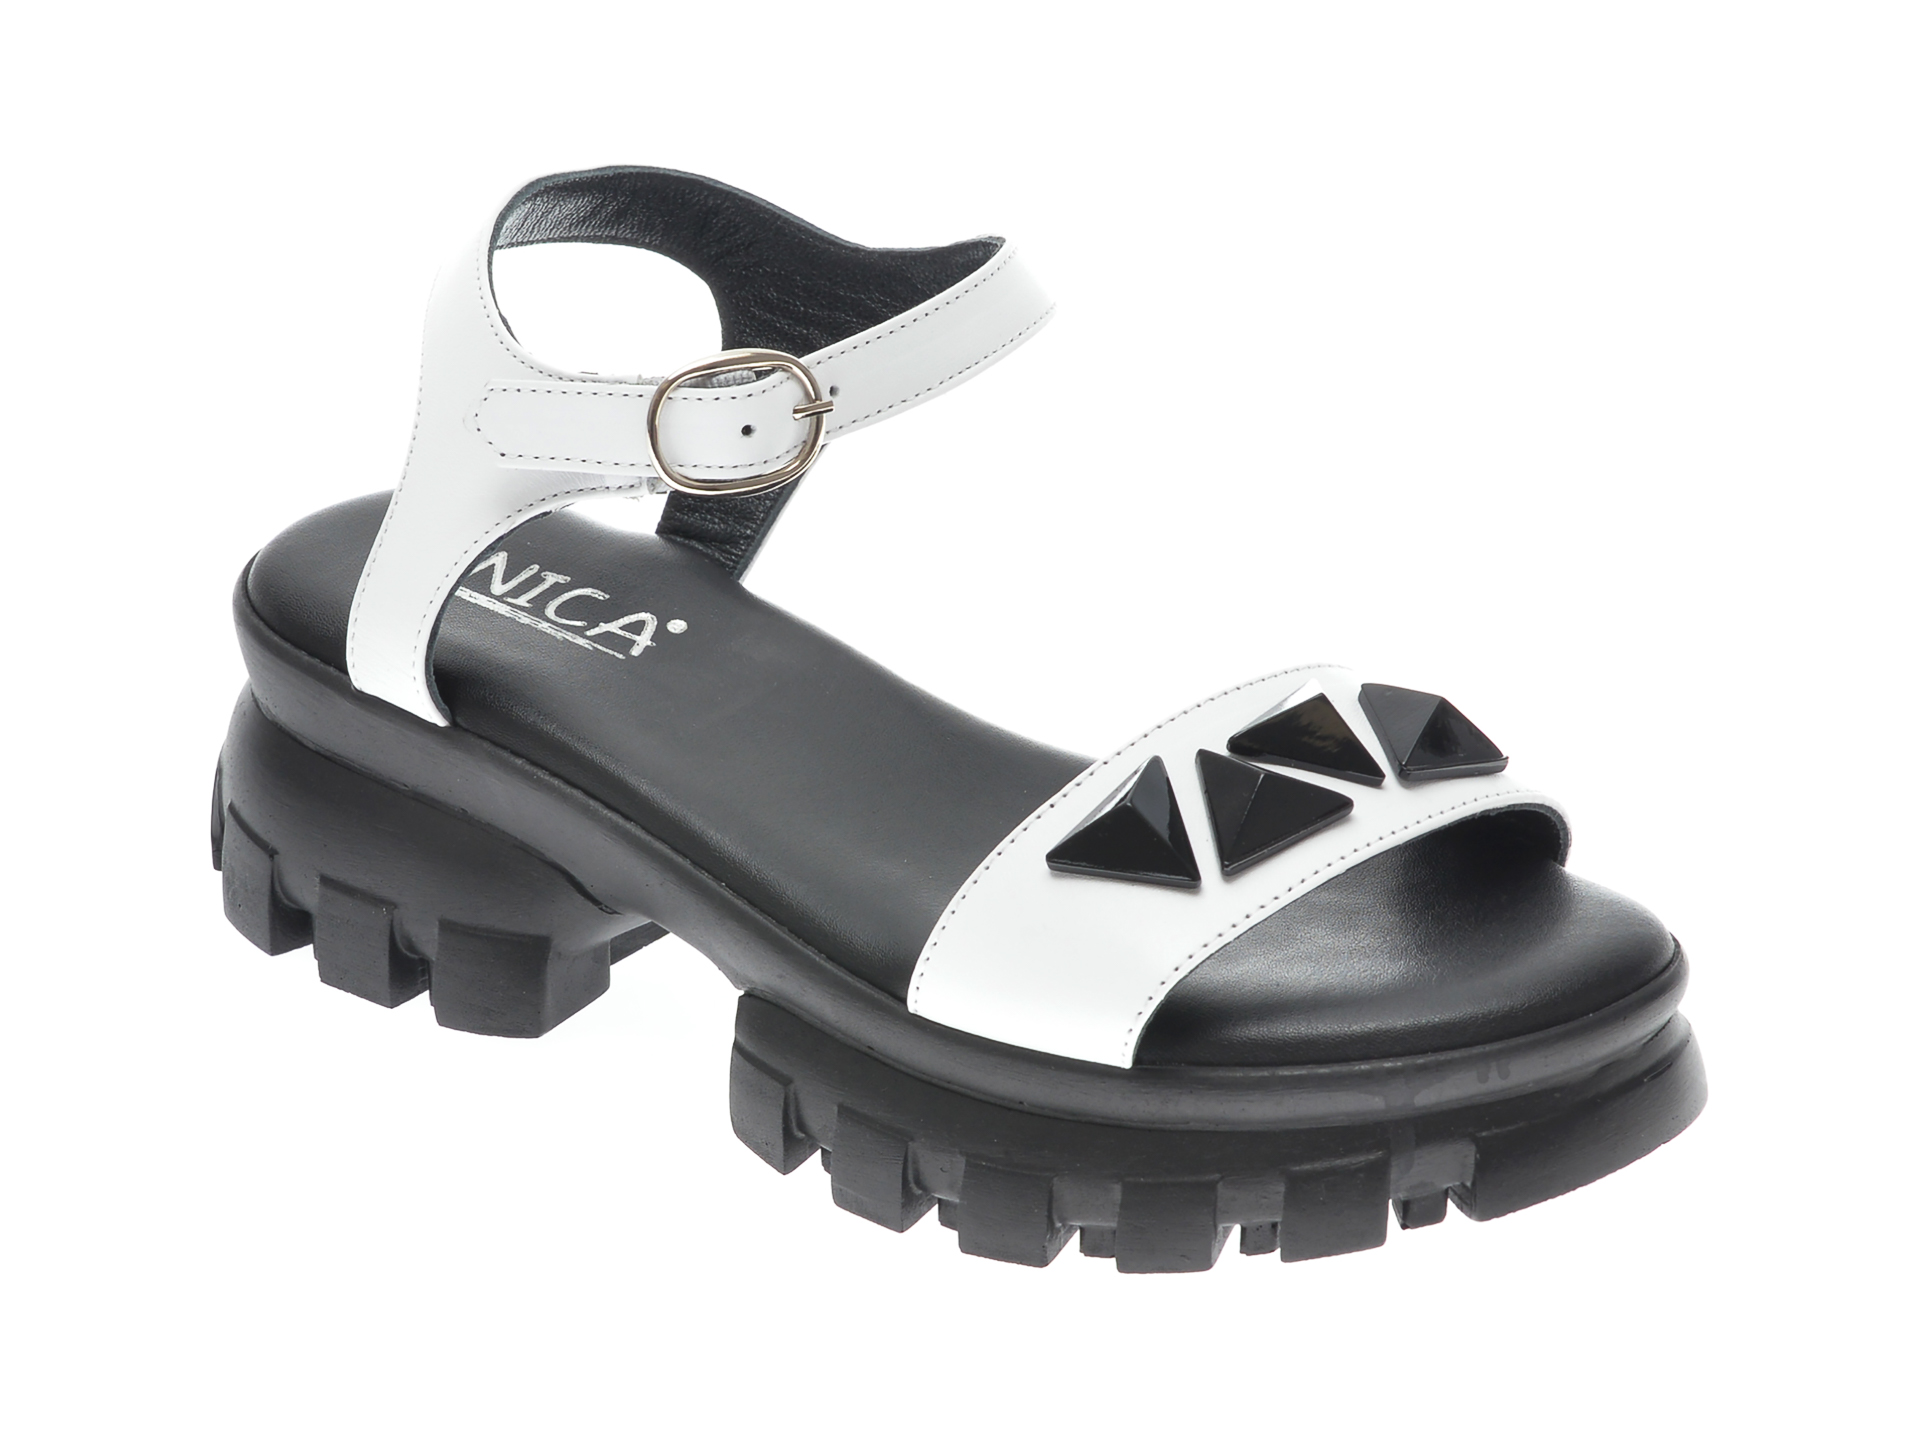 Sandale UNICA albe, A6734, din piele naturala imagine 2021 otter.ro